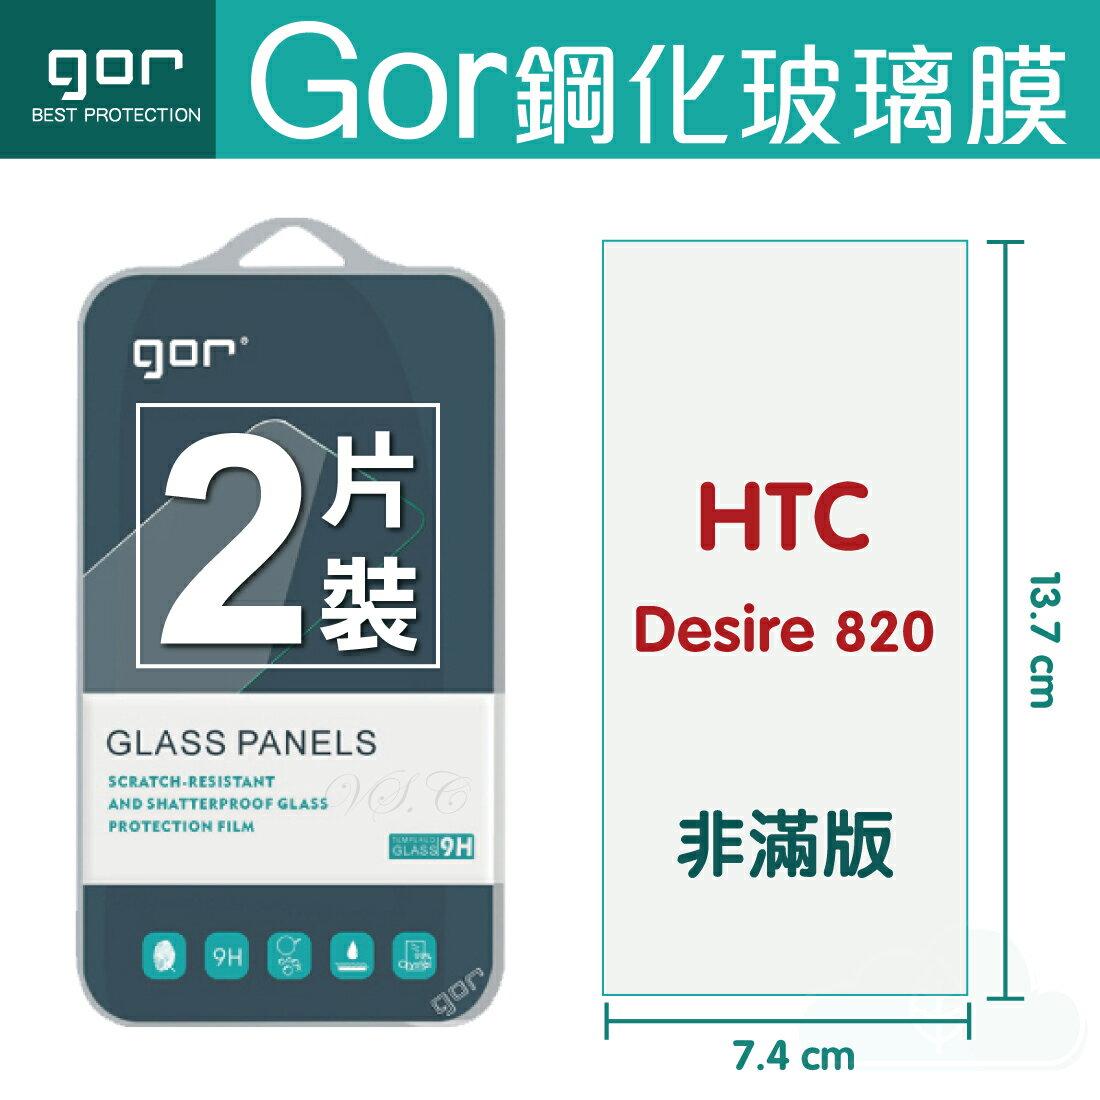 【HTC】GOR 9H HTC Desire 820 鋼化 玻璃 保護貼 全透明非滿版 兩片裝 【全館滿299免運費】